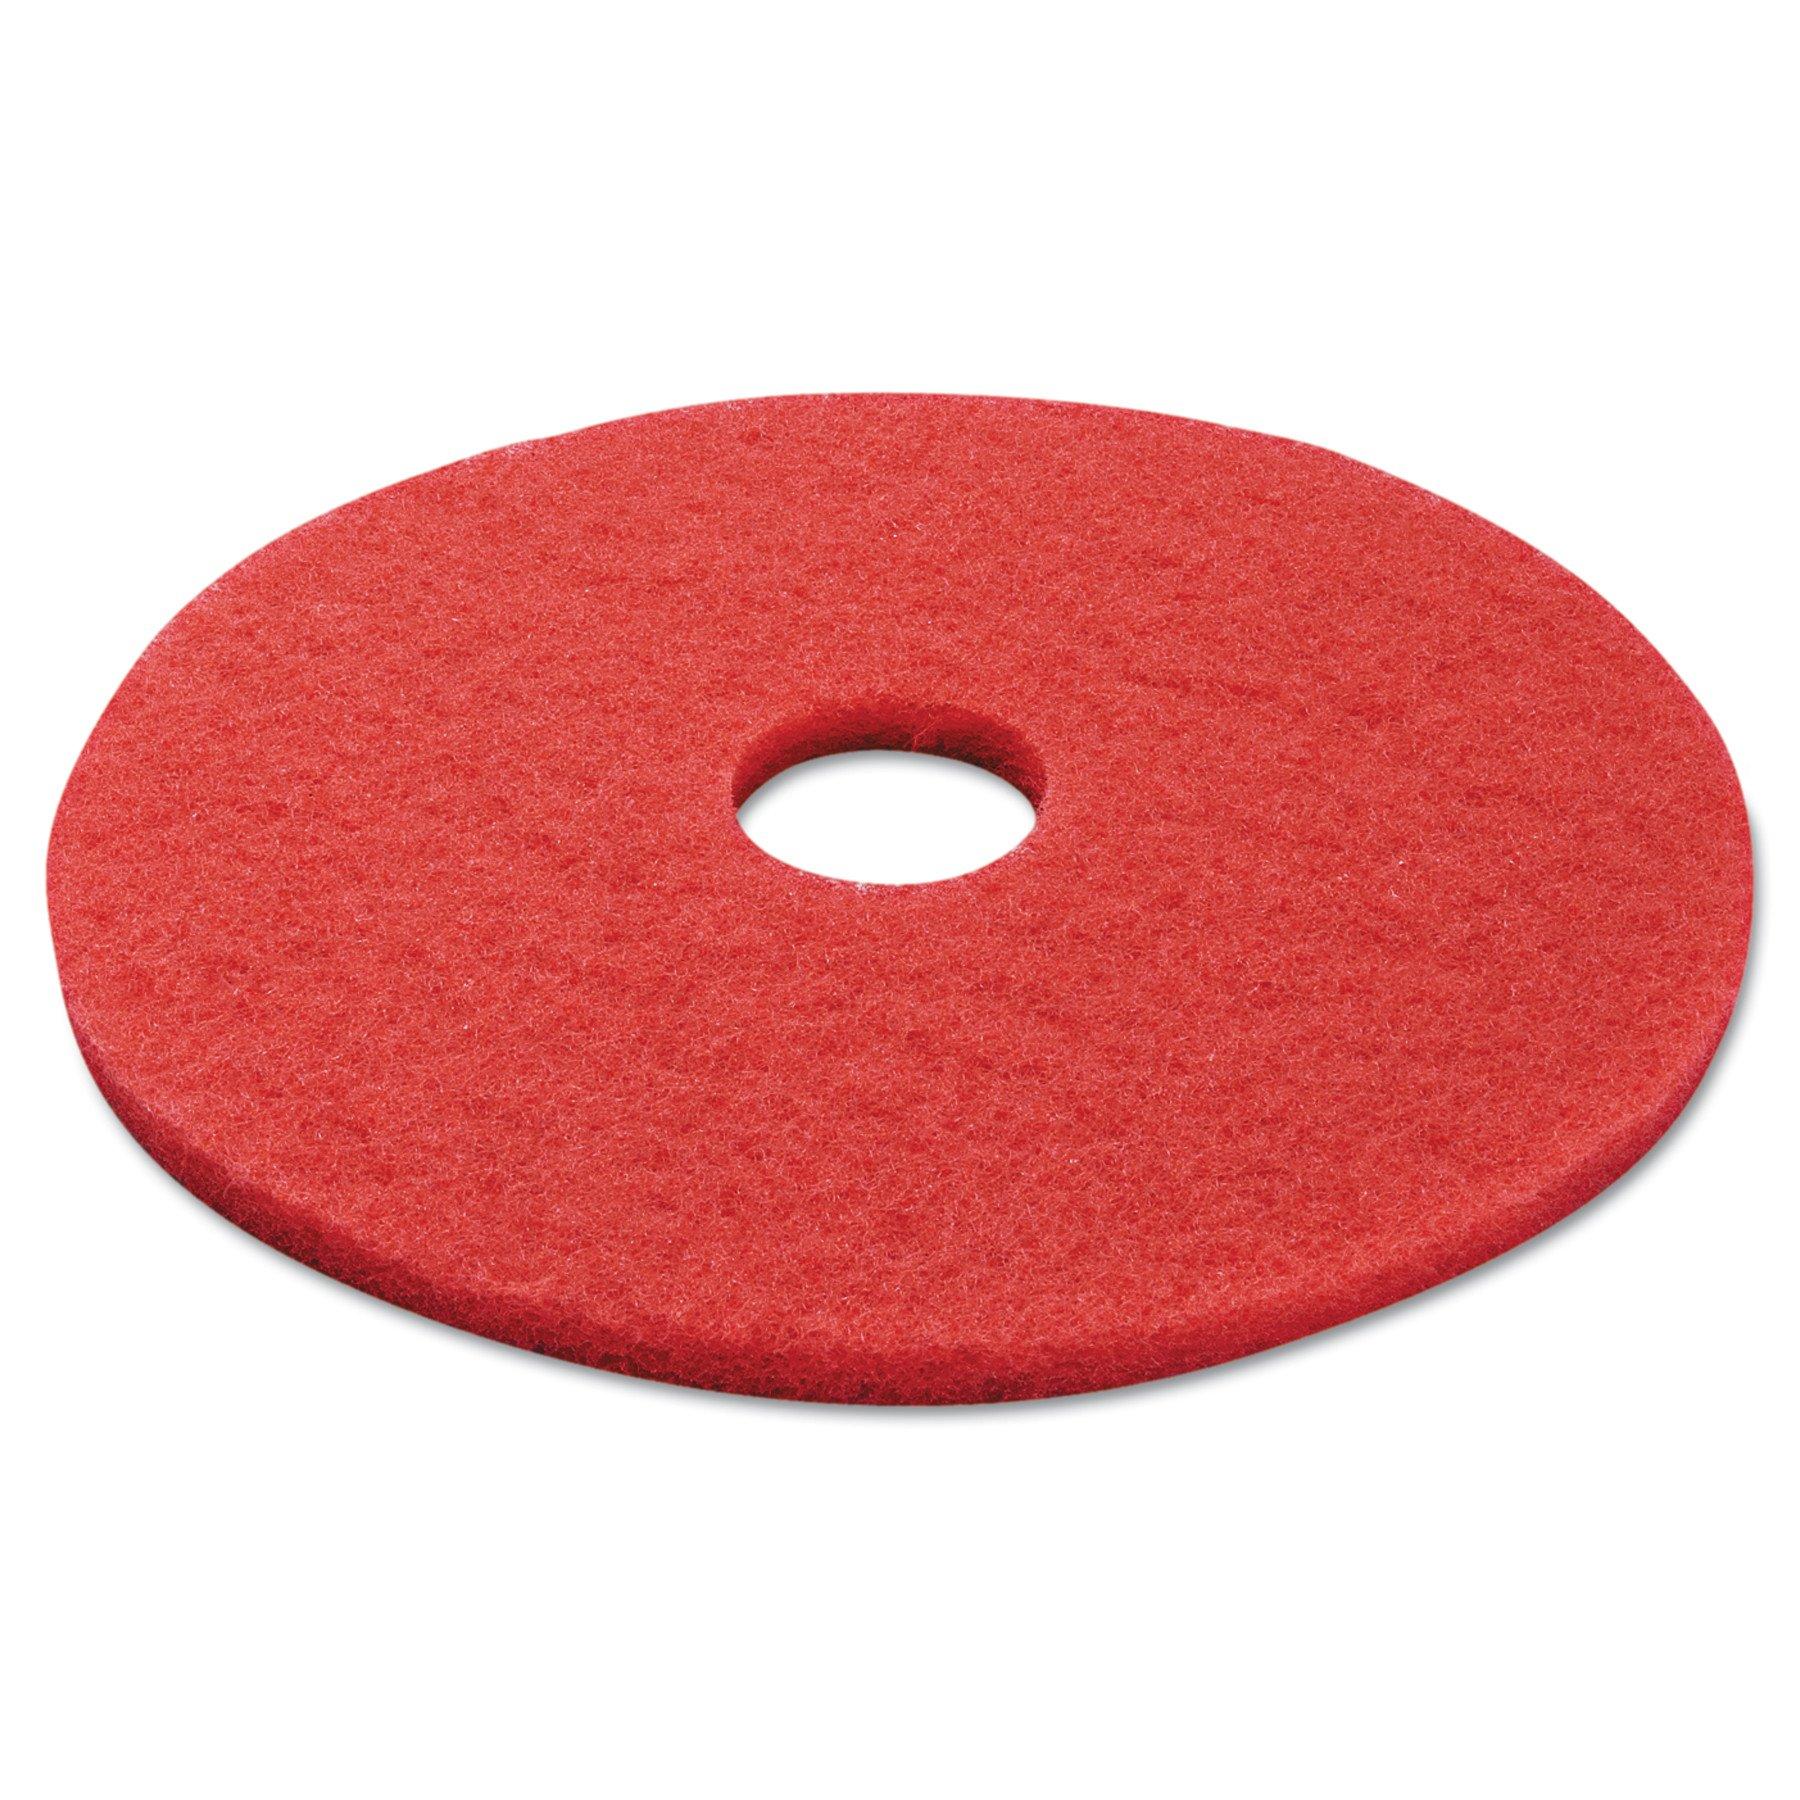 Boardwalk BWK4017RED Standard Buffing Floor Pads, 17'' Diameter, Red (Case of 5)